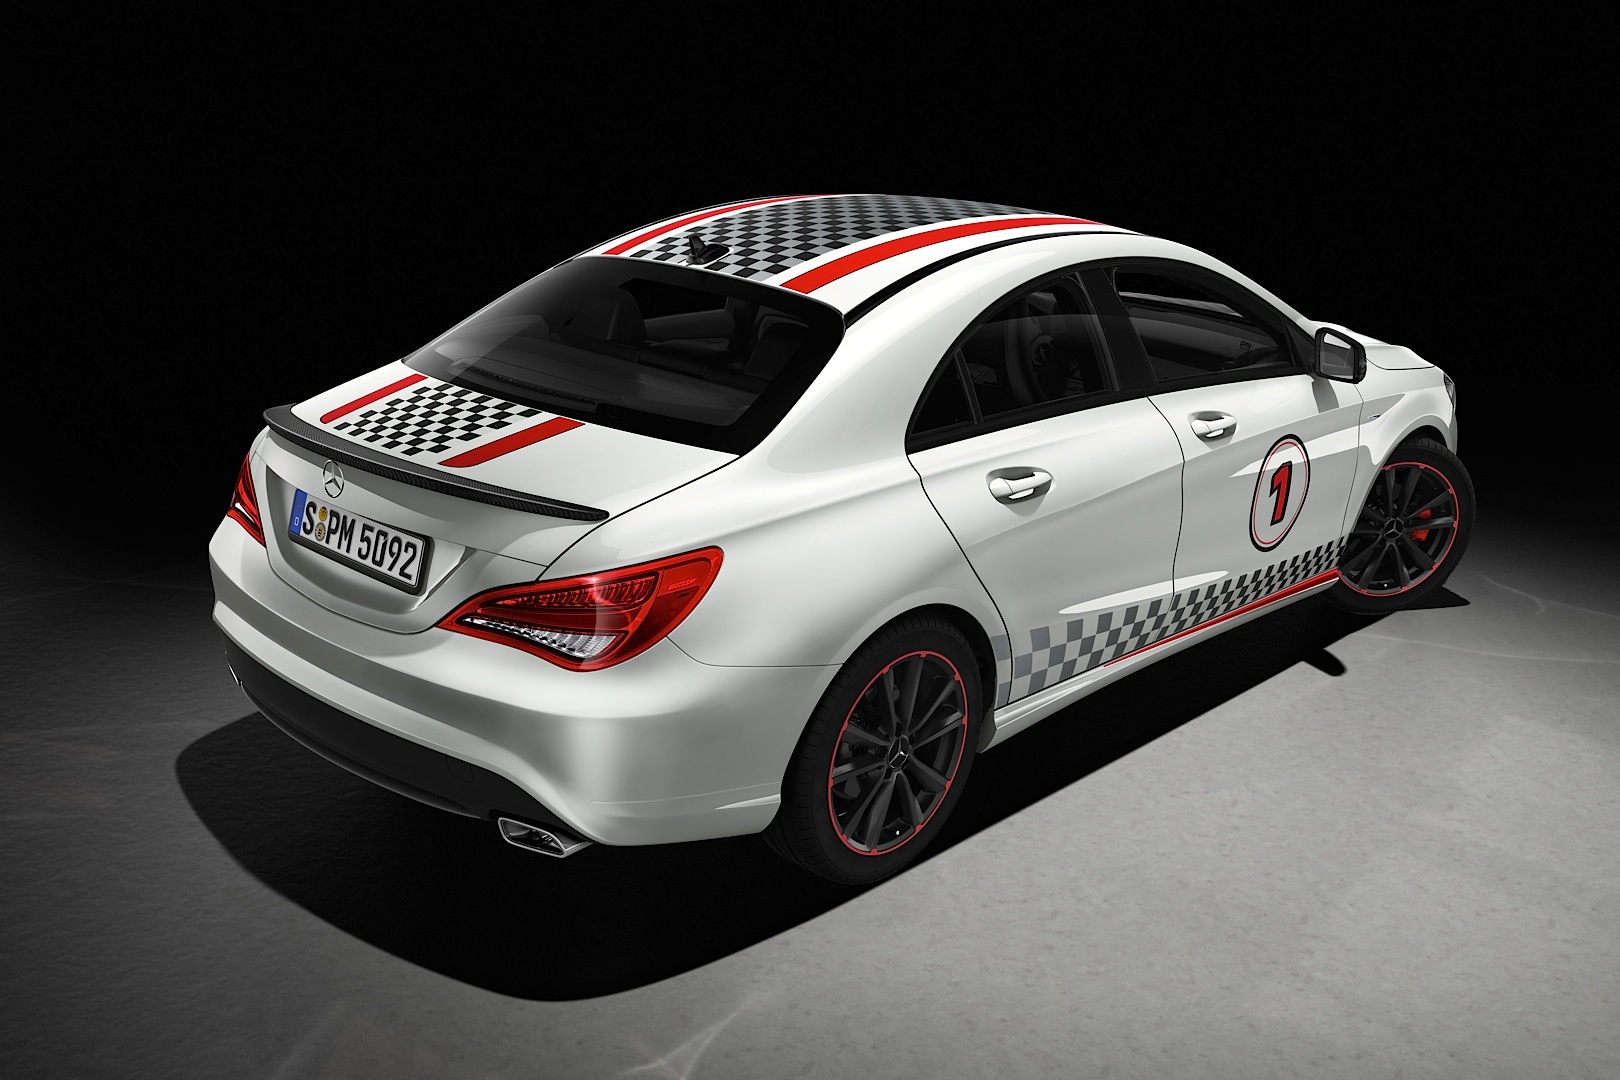 Mercedes Cla 250 >> Sport-Themed CLA is All Show, Less Go at Frankfurt - autoevolution